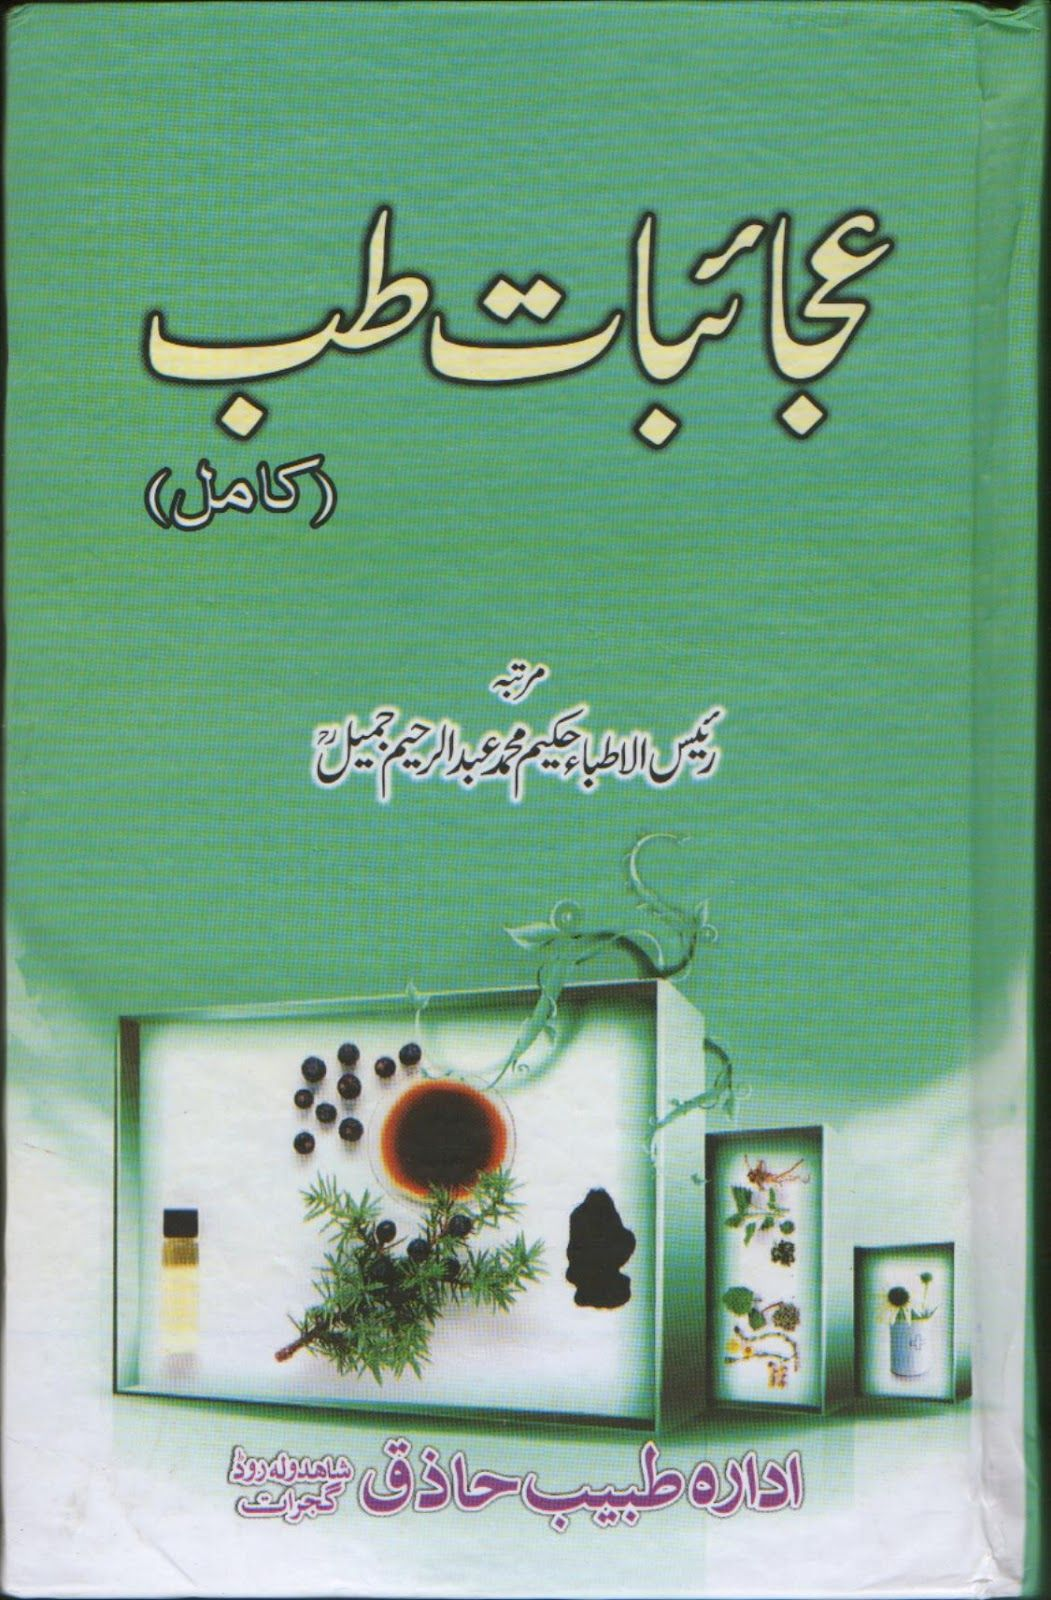 Shan e Ali Book Shop** کُتب خانہ شانِ علی** Hikmat wa